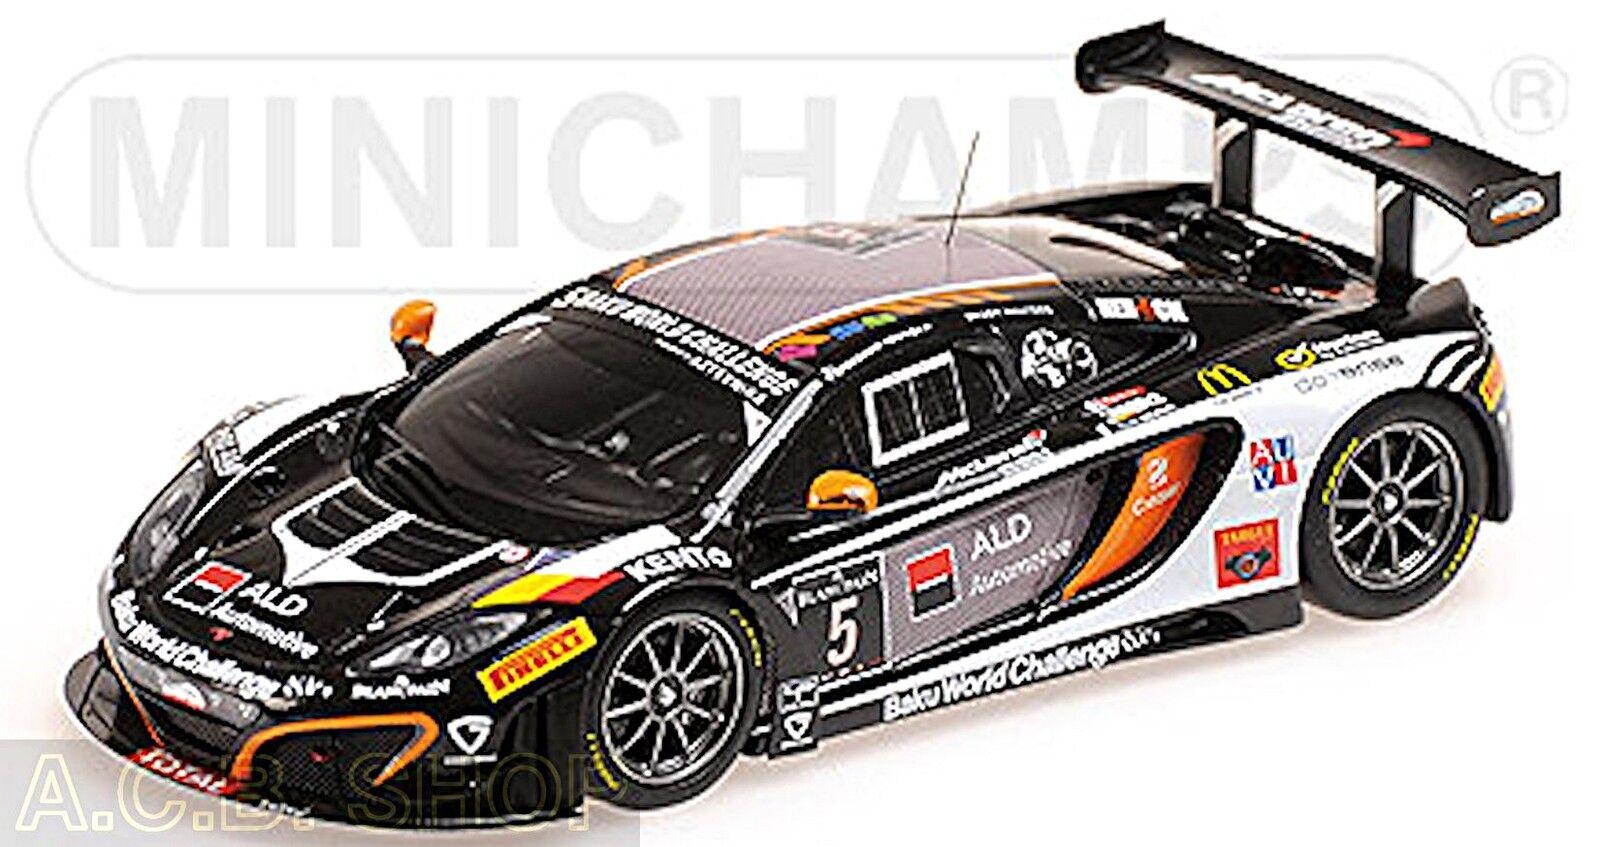 Mclaren 12c Gt3 24 H Spa 2013 - Boutson Ginion Racing  43 Minichamps